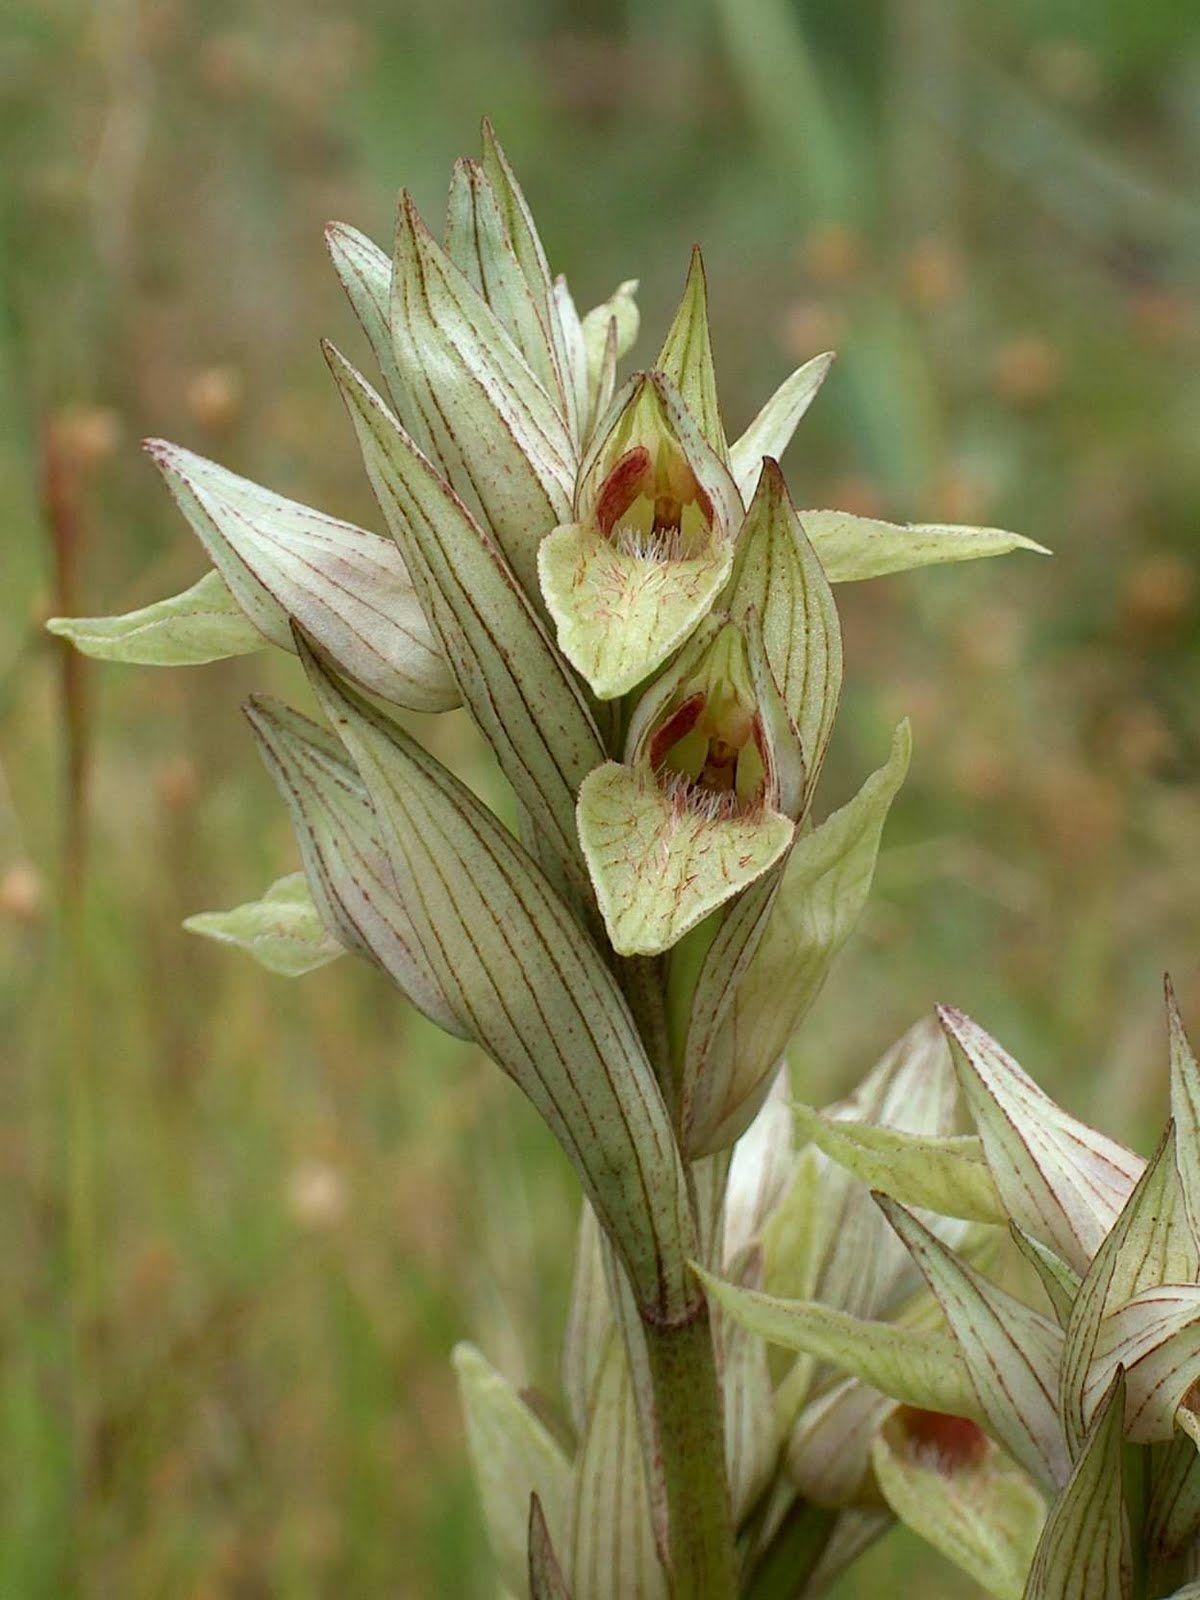 Serapias perez-chiscanoi (Gallos, Serapias de Chiscano)